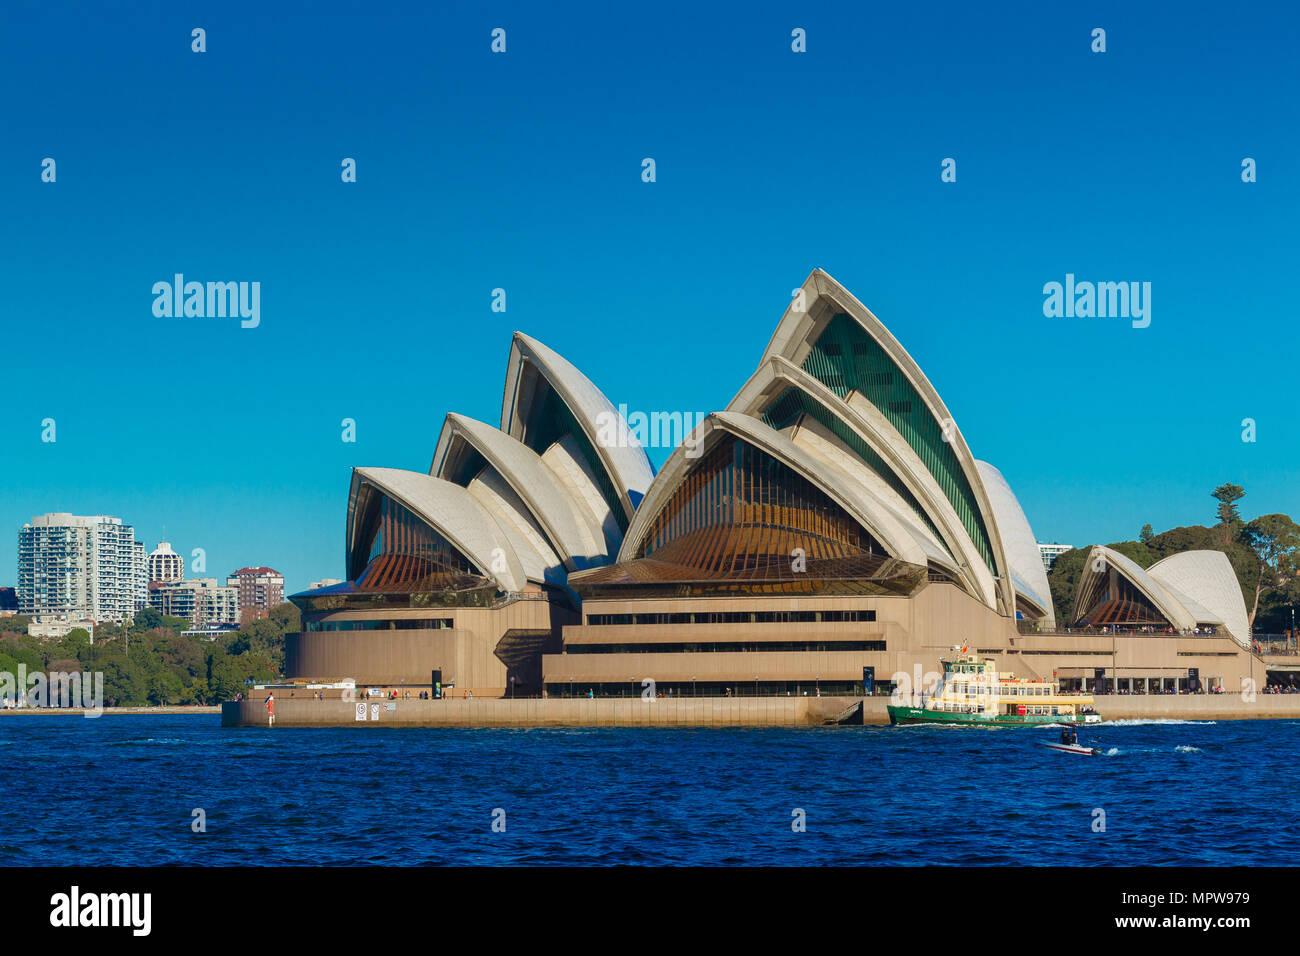 Sydney Opera House on Sydney Harbour in Australia. - Stock Image